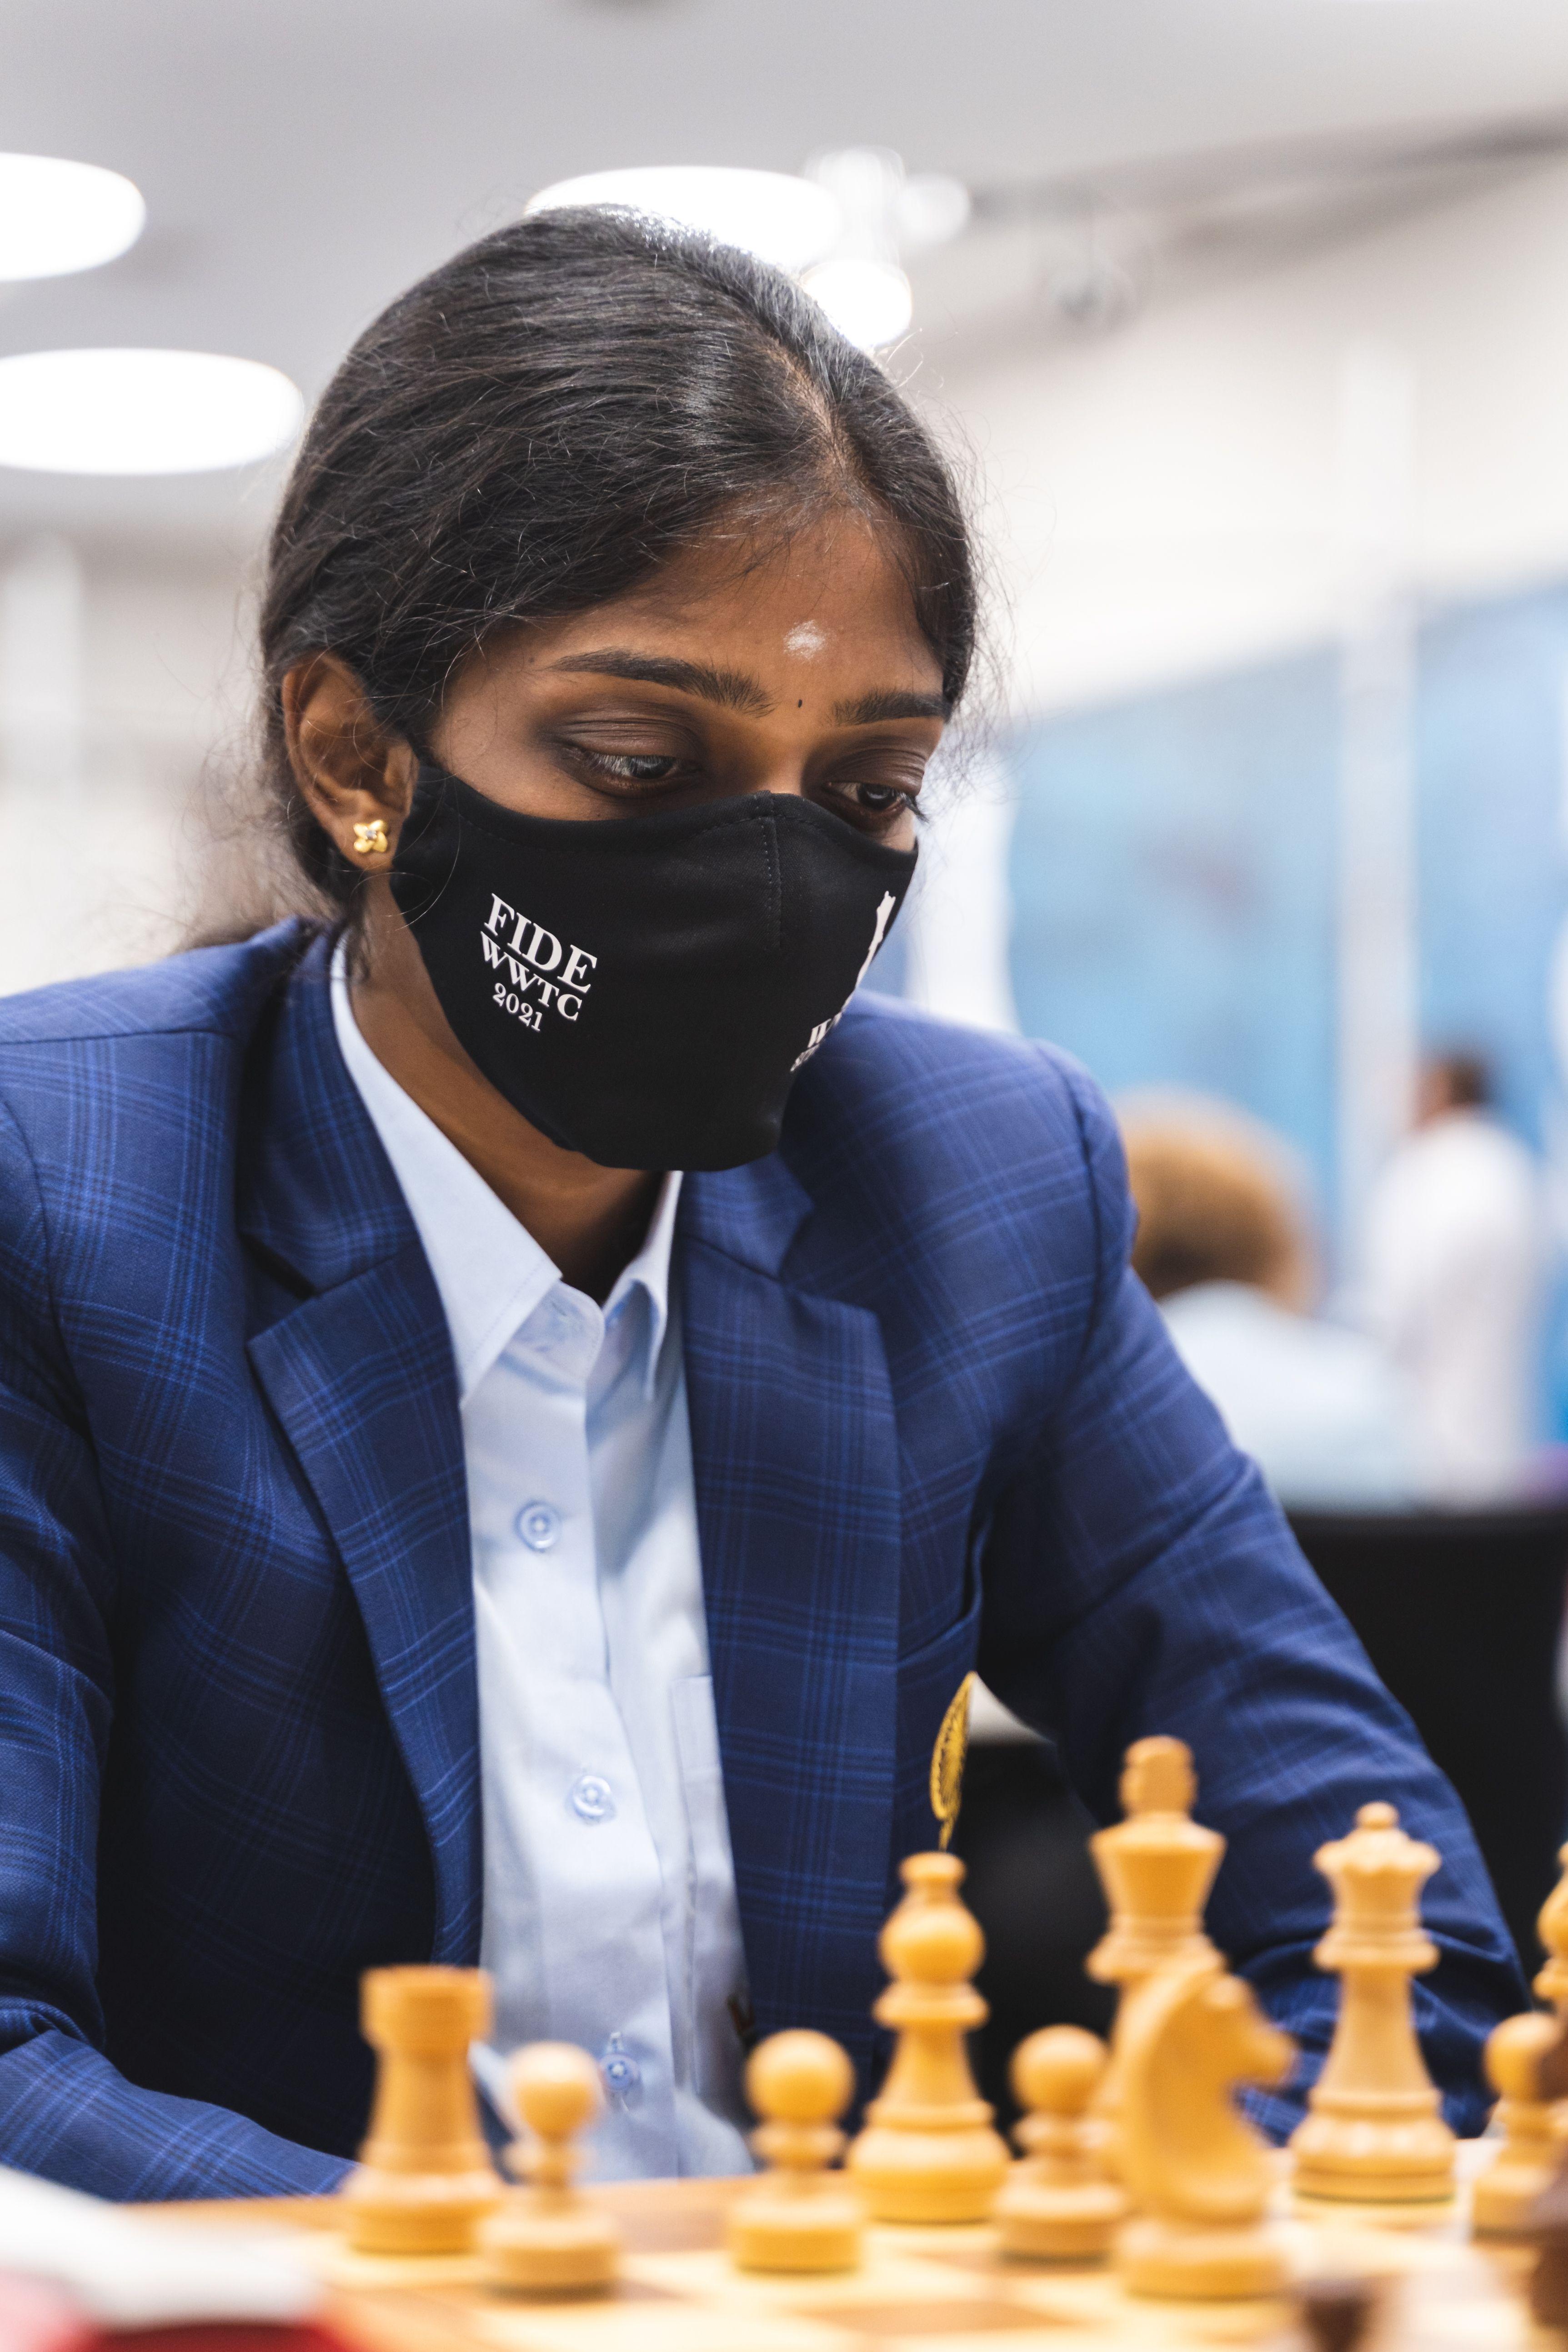 WGM Vaishali Rameshbabu of India at the Women's World Team Championship